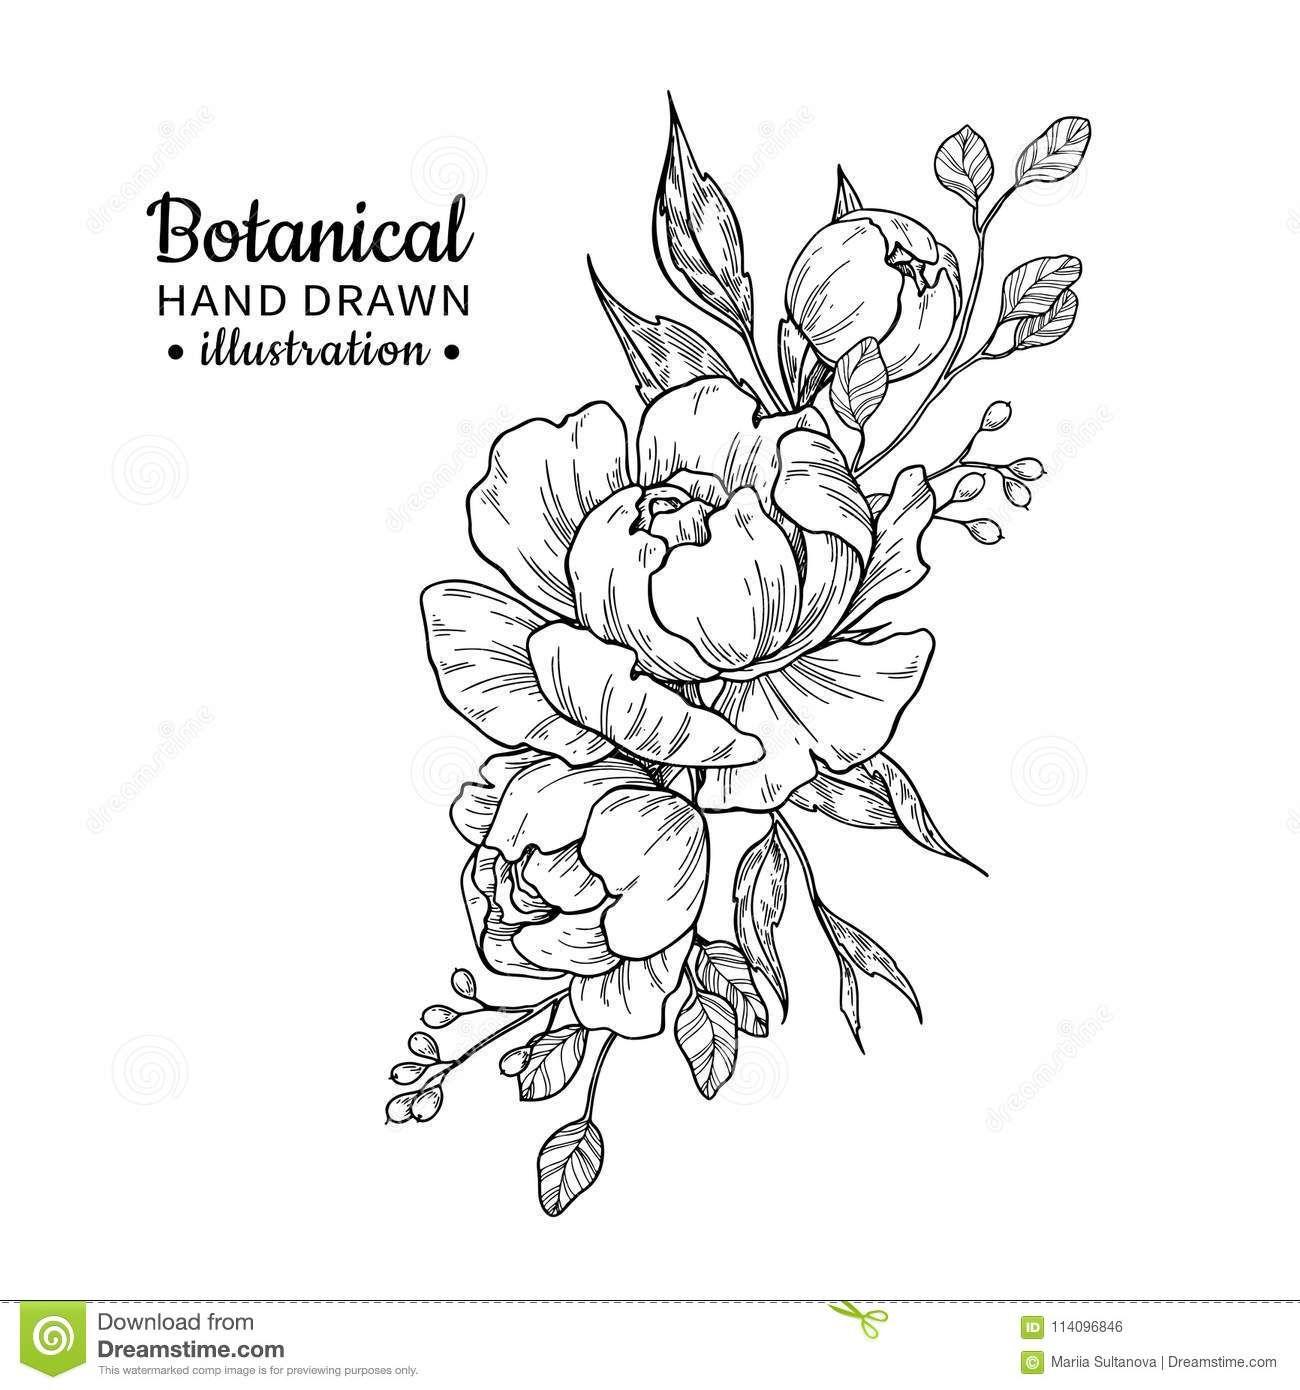 Tat image by Samsara Gayle Flower bouquet drawing